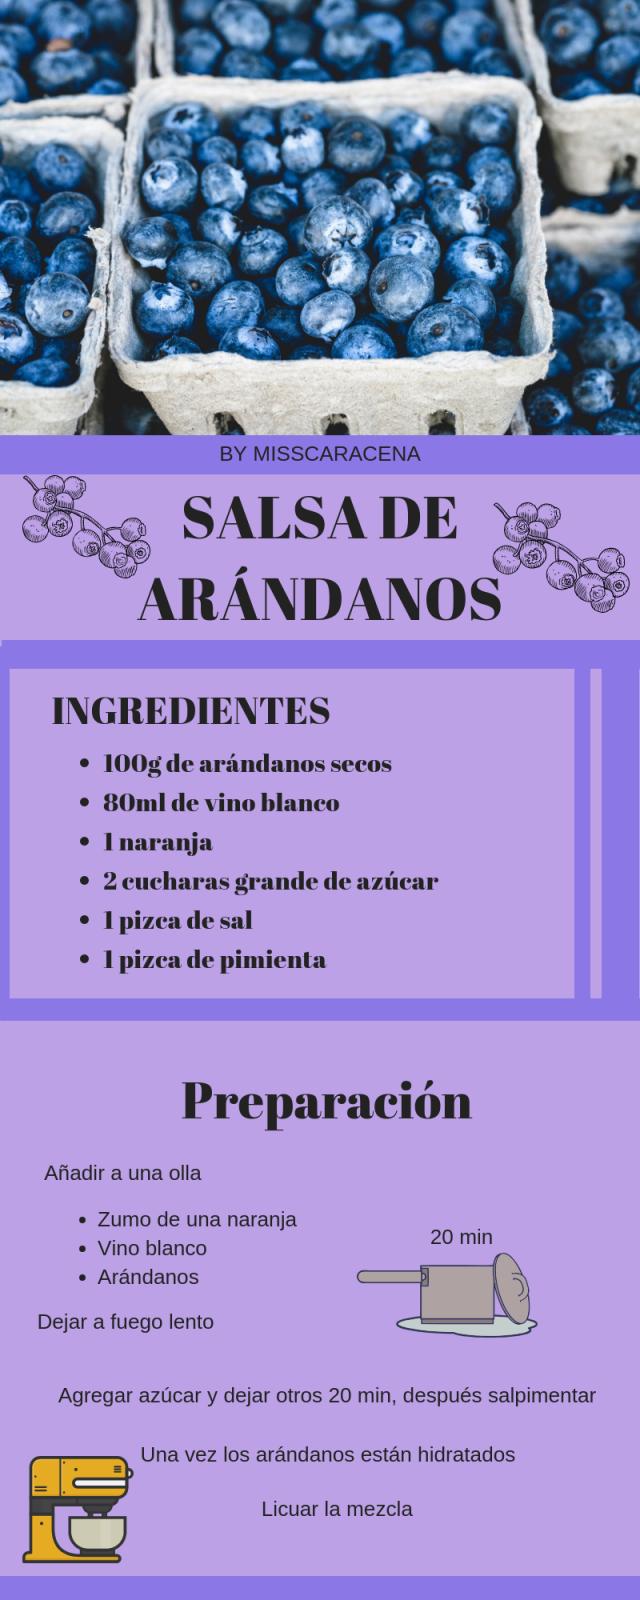 SALSA DE ARANDANOS